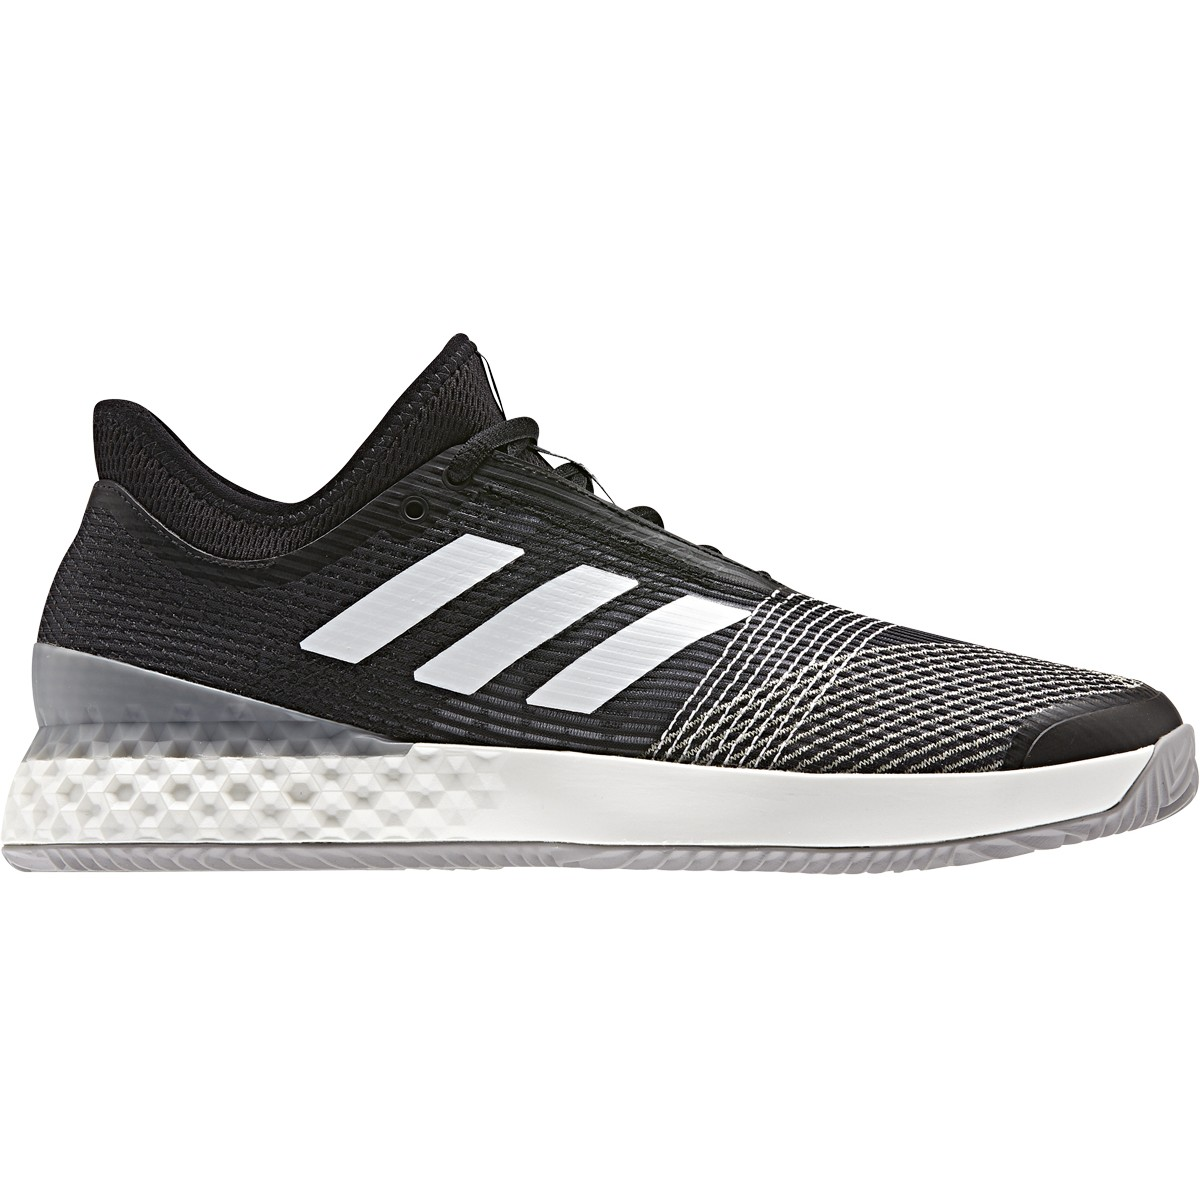 Zapatillas Adidas Adizero Ubersonic 3 verde 46